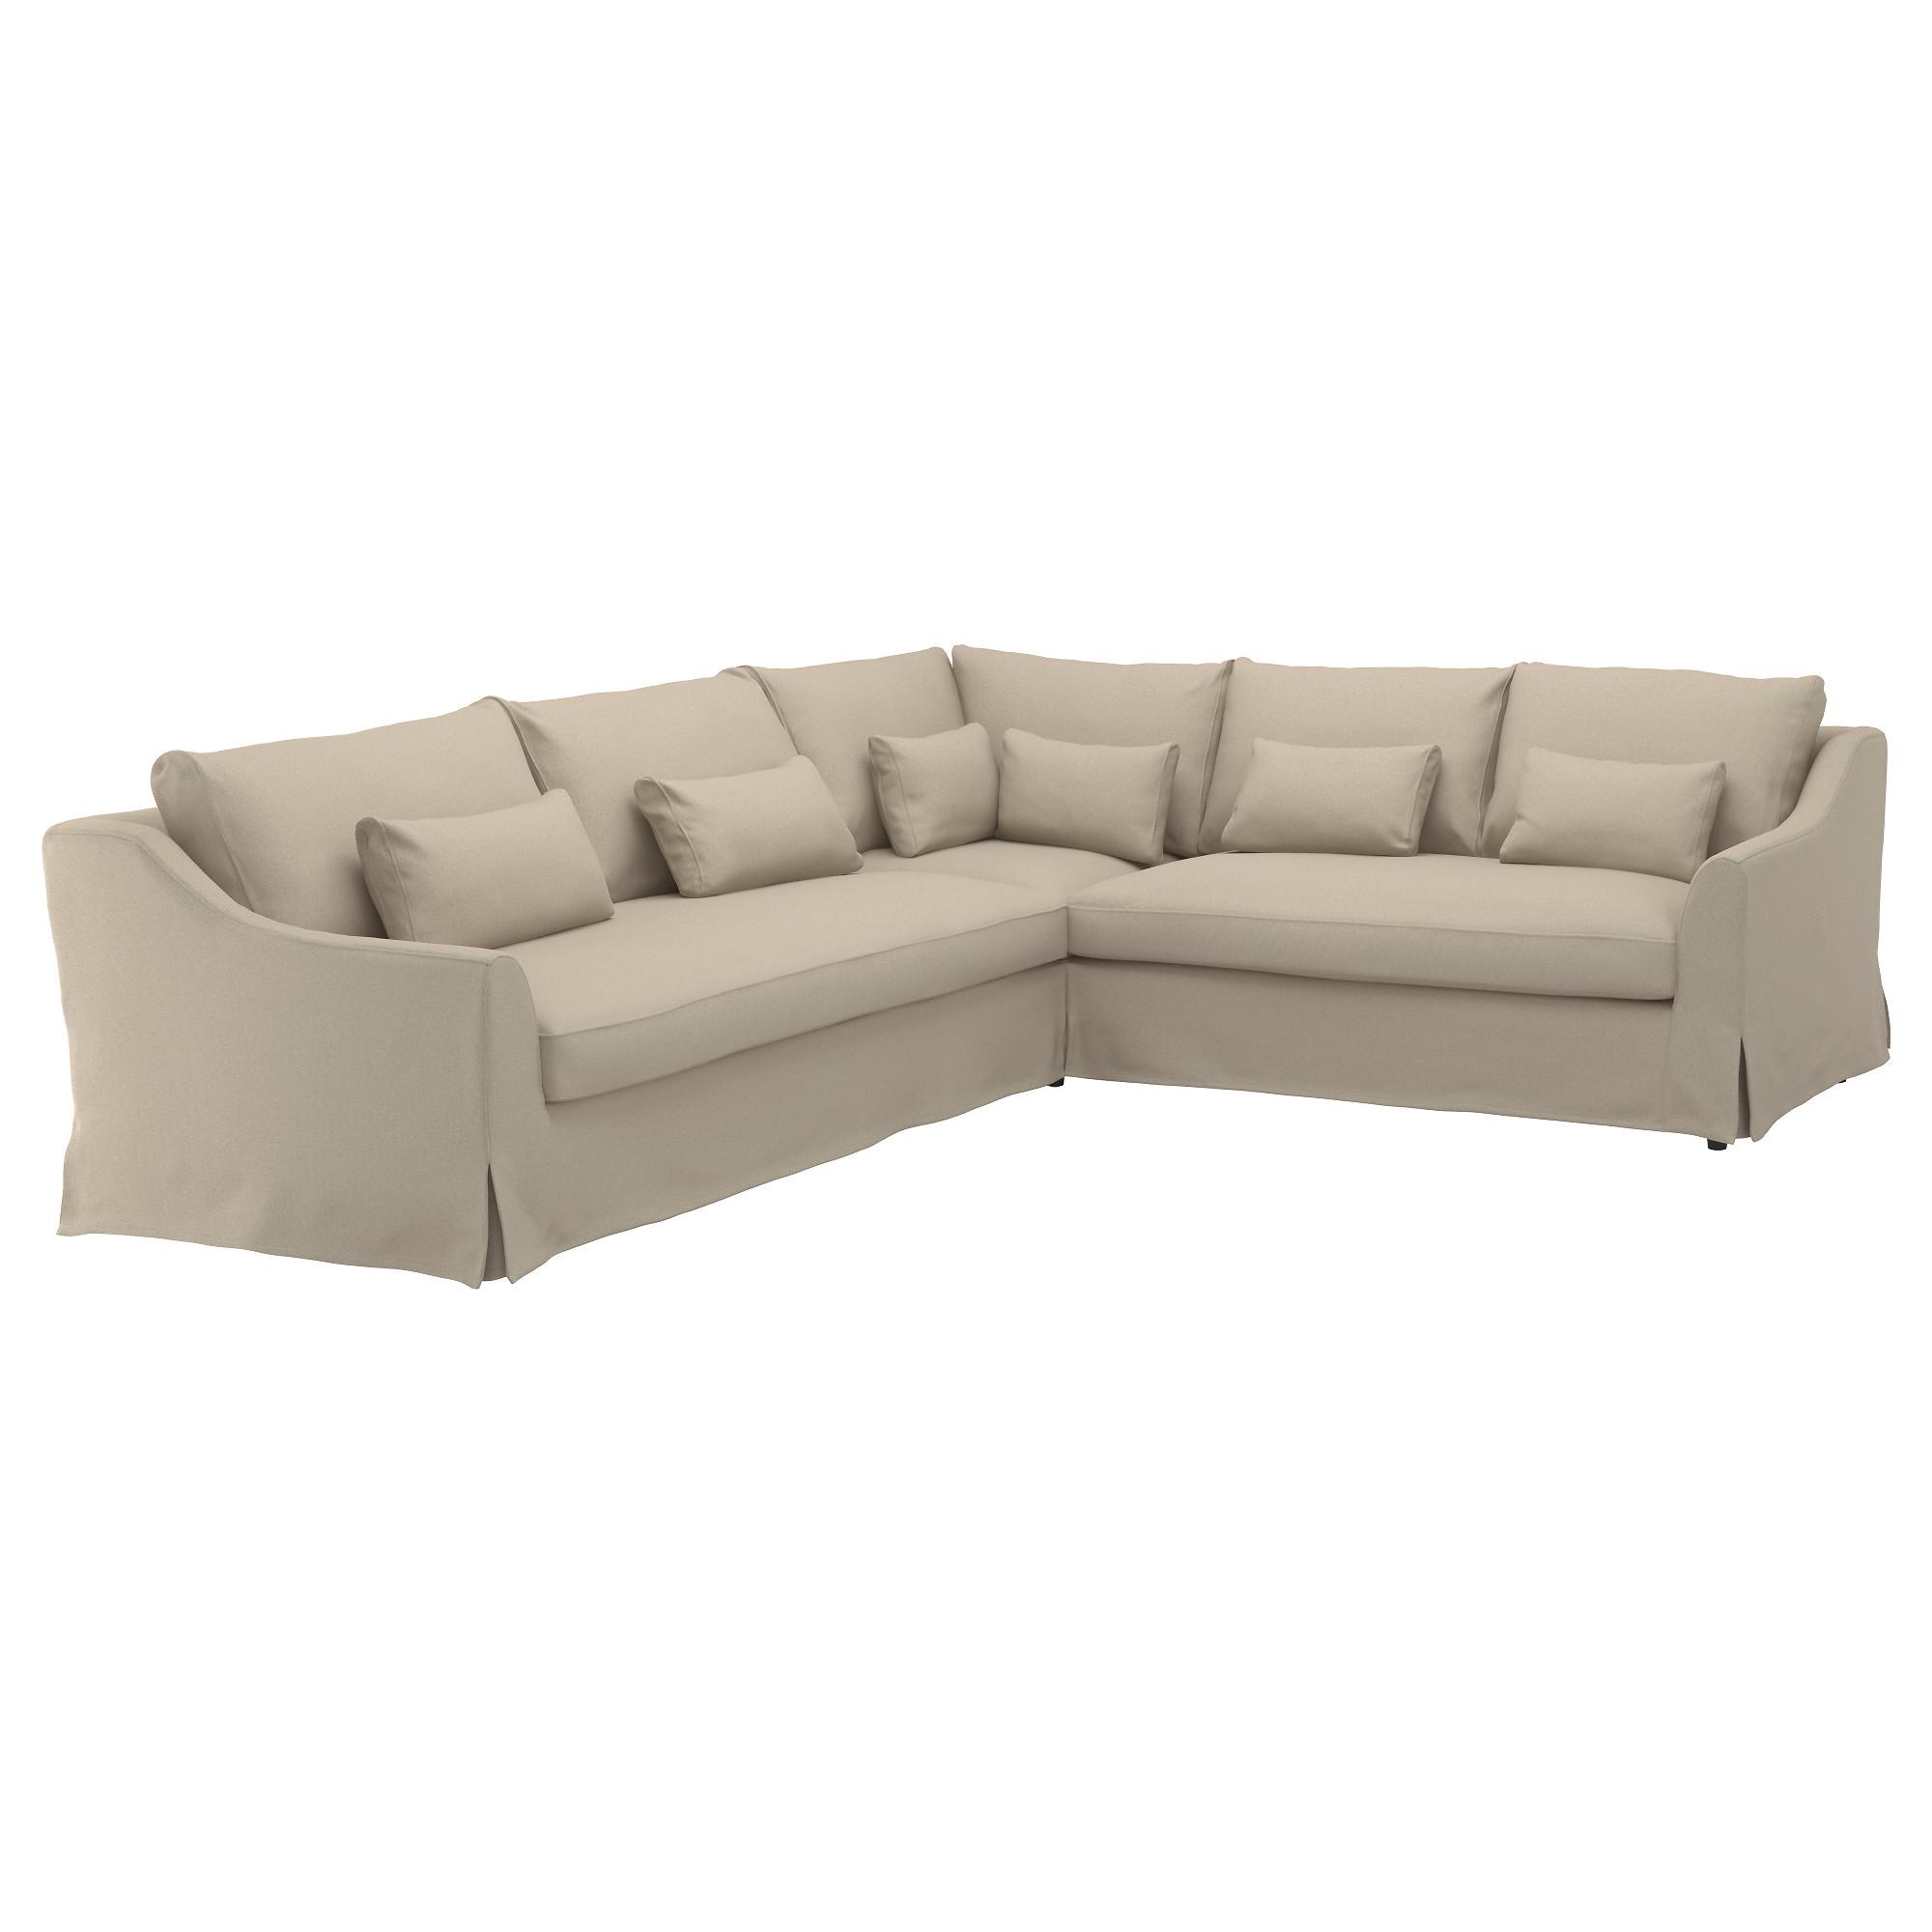 ikea färlöv corner sofa 3+2 10 year guarantee. read about the terms in CAAMXAR